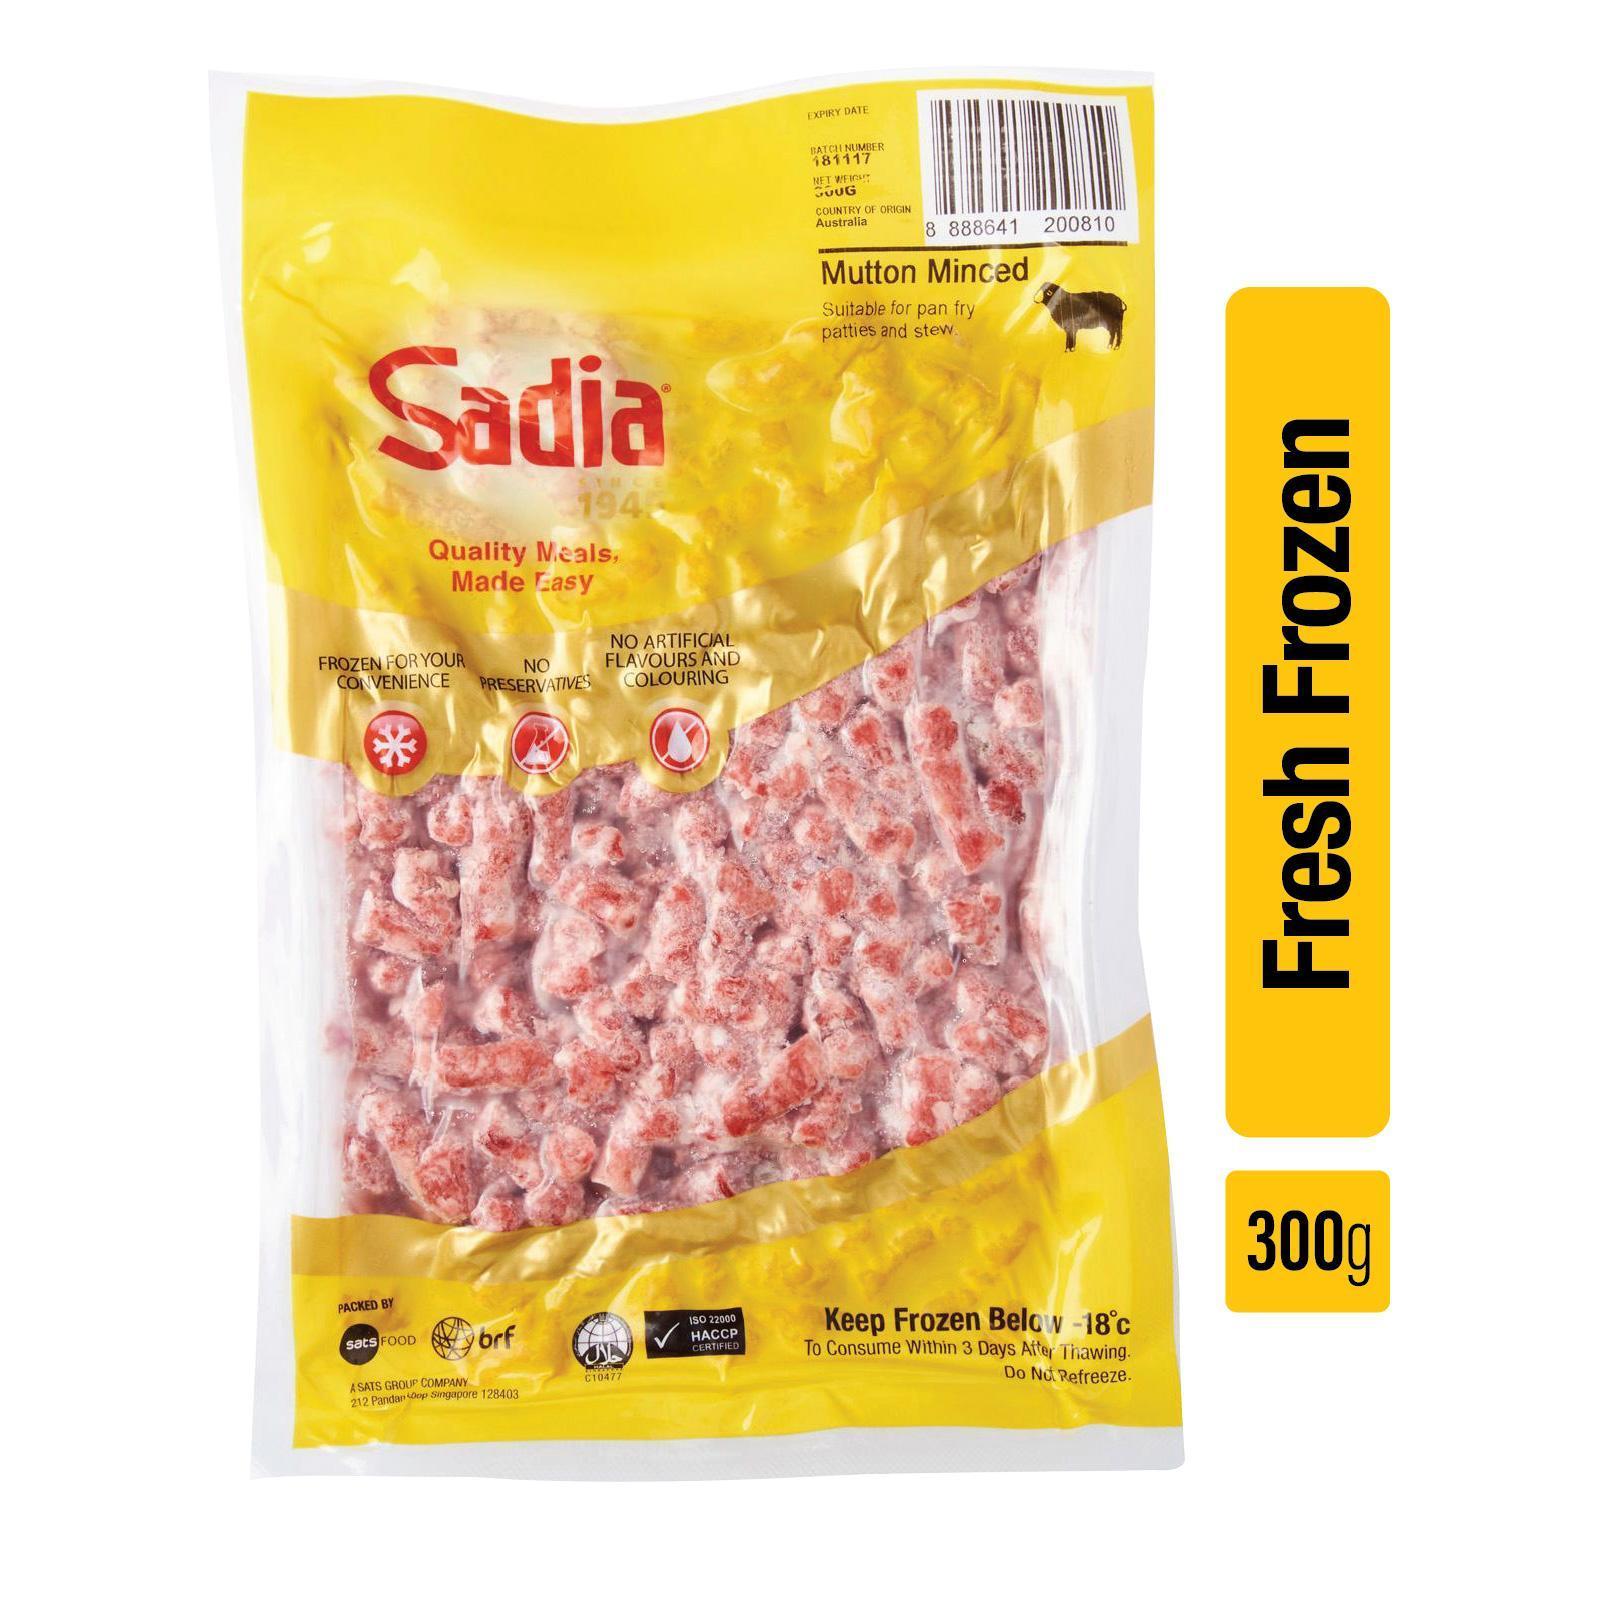 Sadia Mutton Minced - Frozen